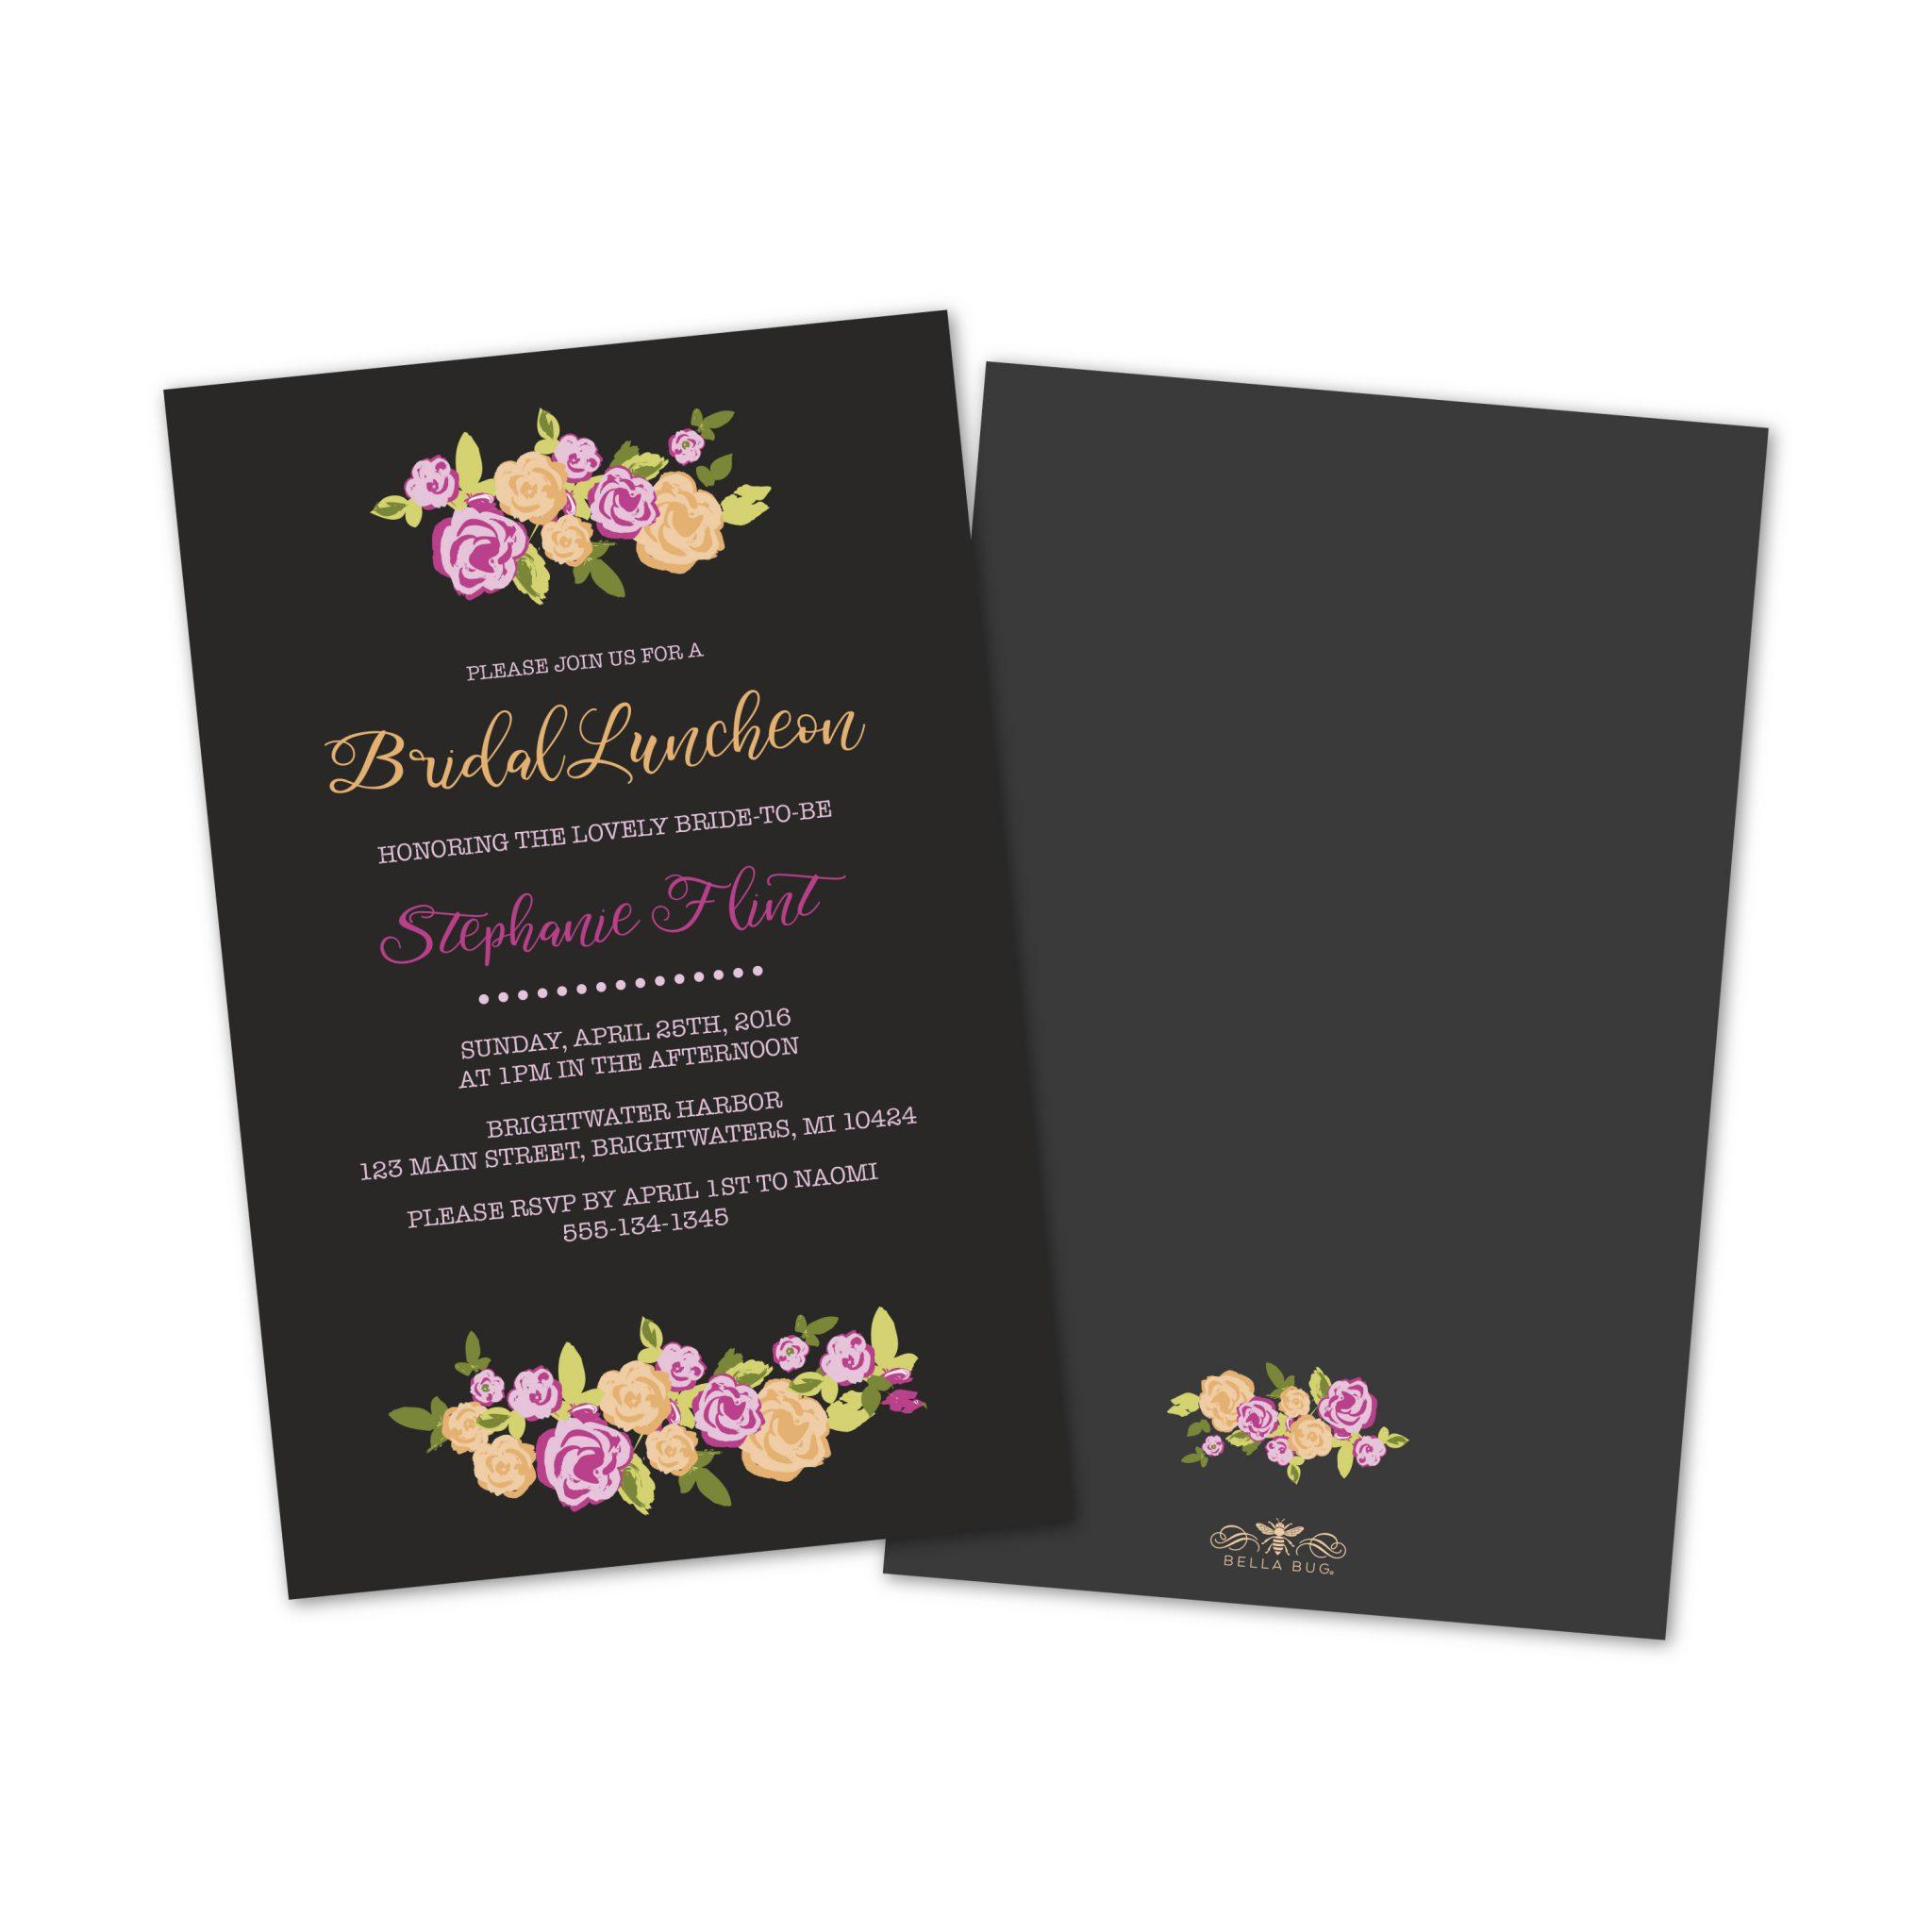 Personalized Bridal Invitations